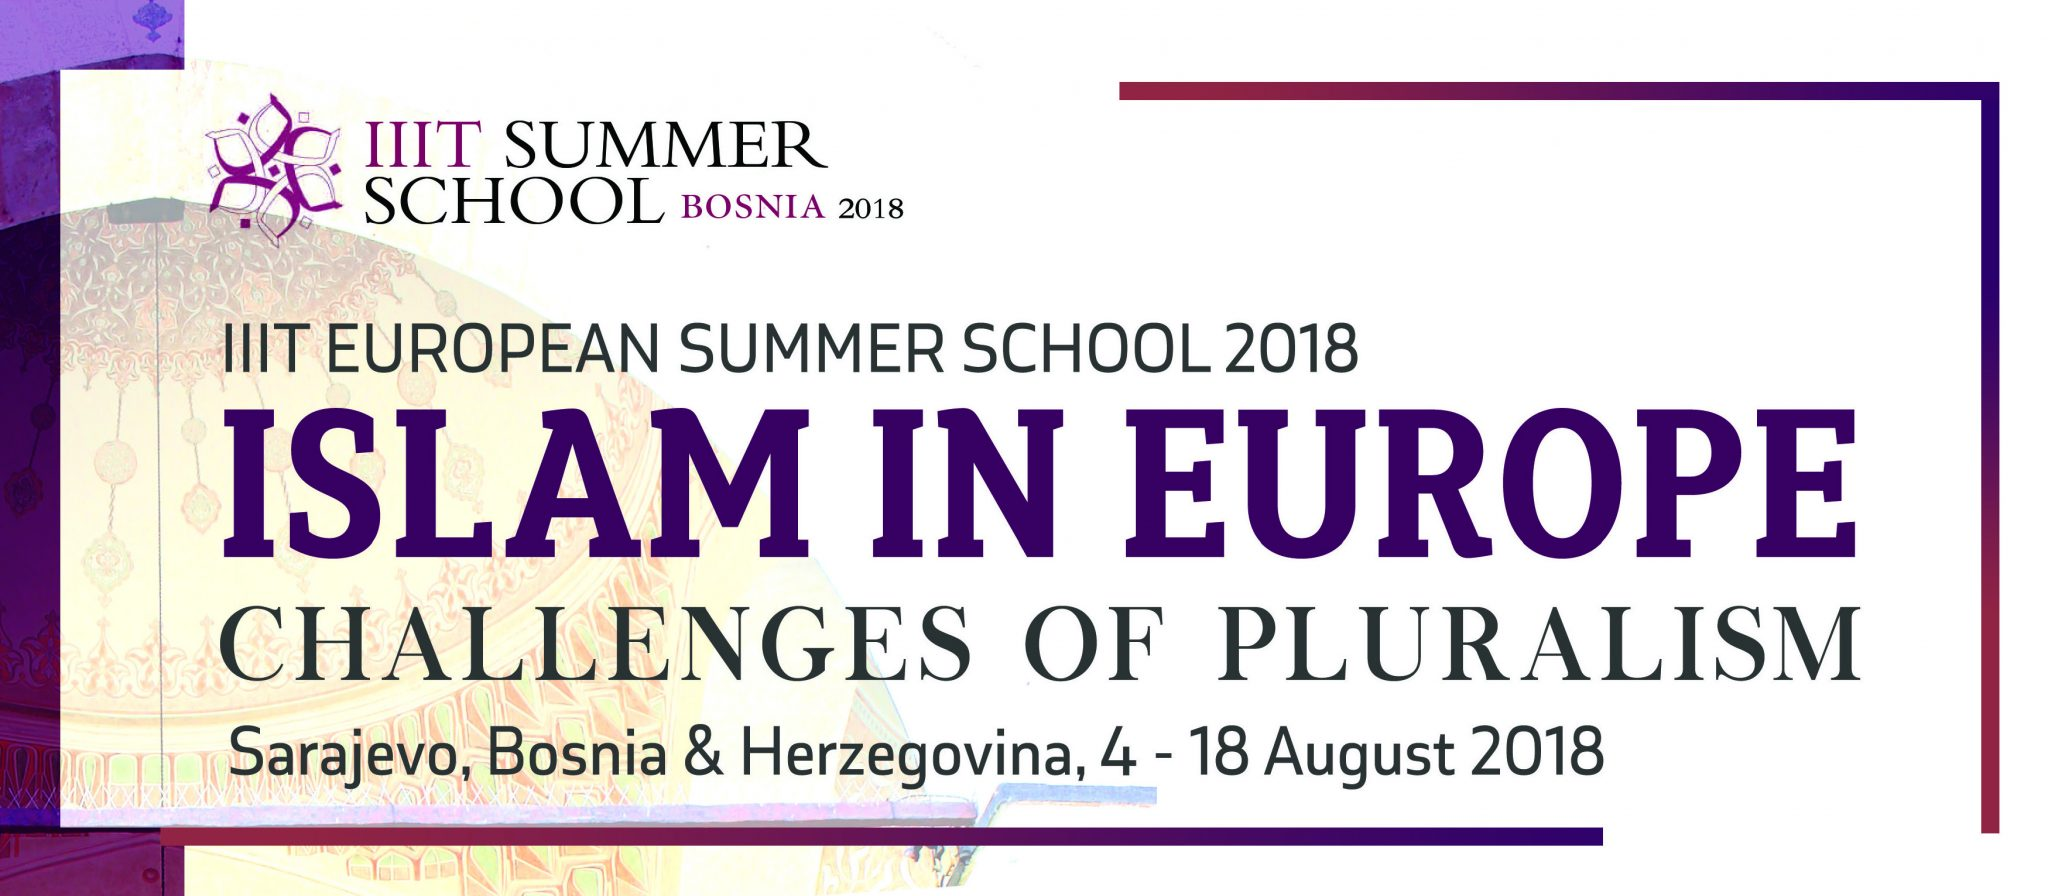 Call for Applications: IIIT European Summer School Islam in Europe: Challenges of Pluralism